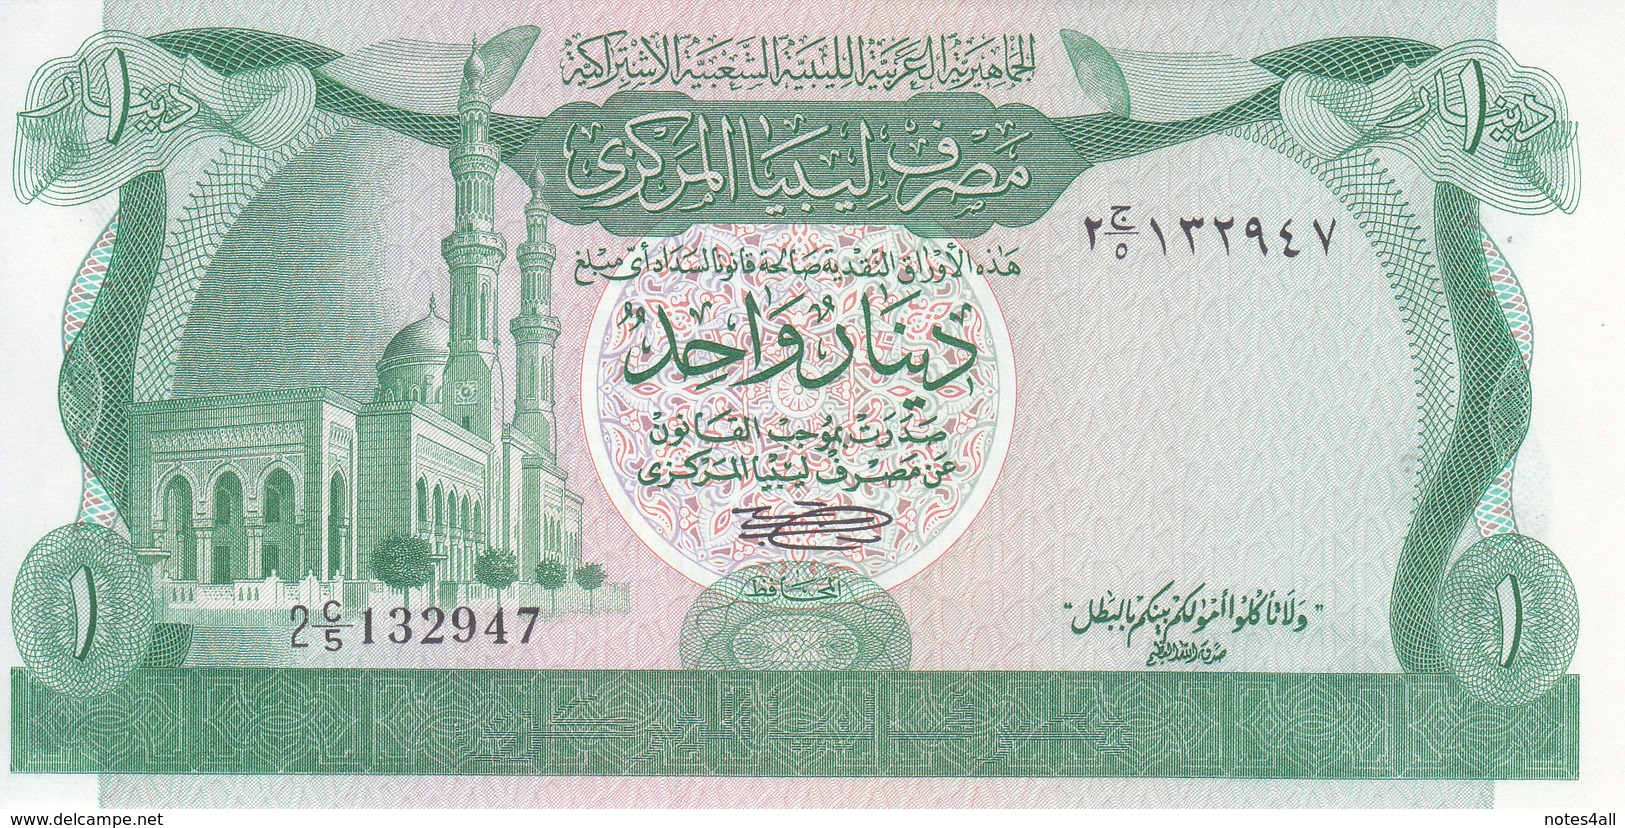 LIBYA 1 DINAR 1981 P-44a SIG/SHERLALA UNC */* - Libya